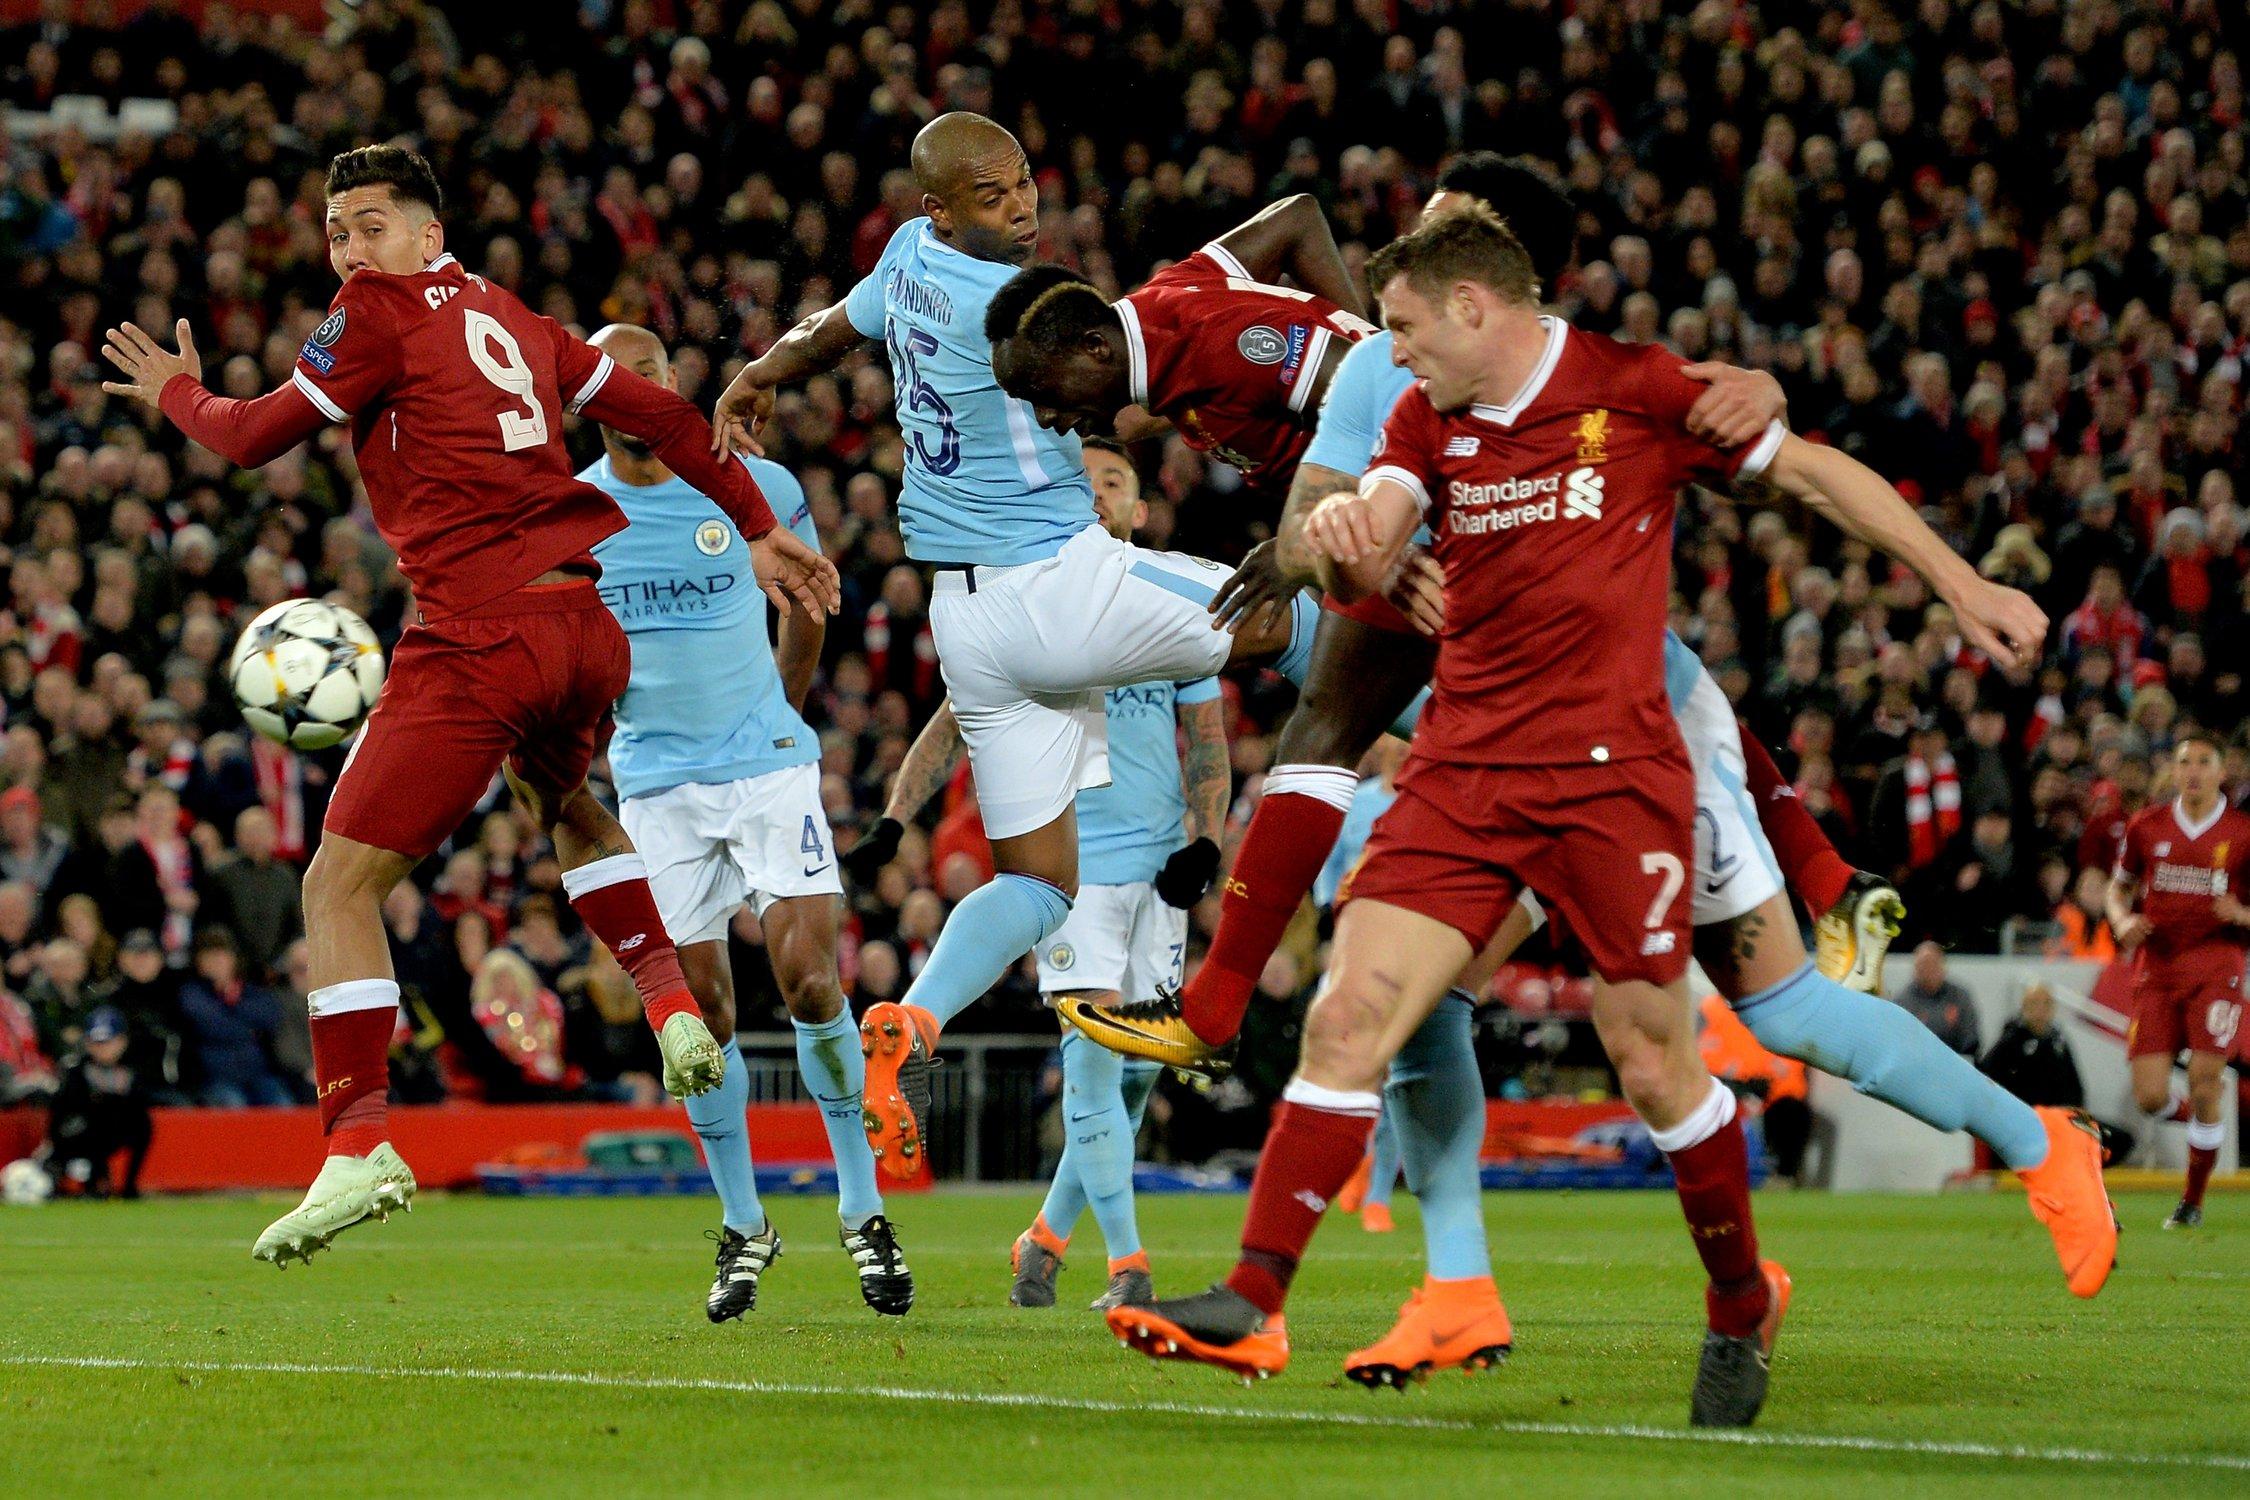 LP – Liverpool deklasirao Manchester City